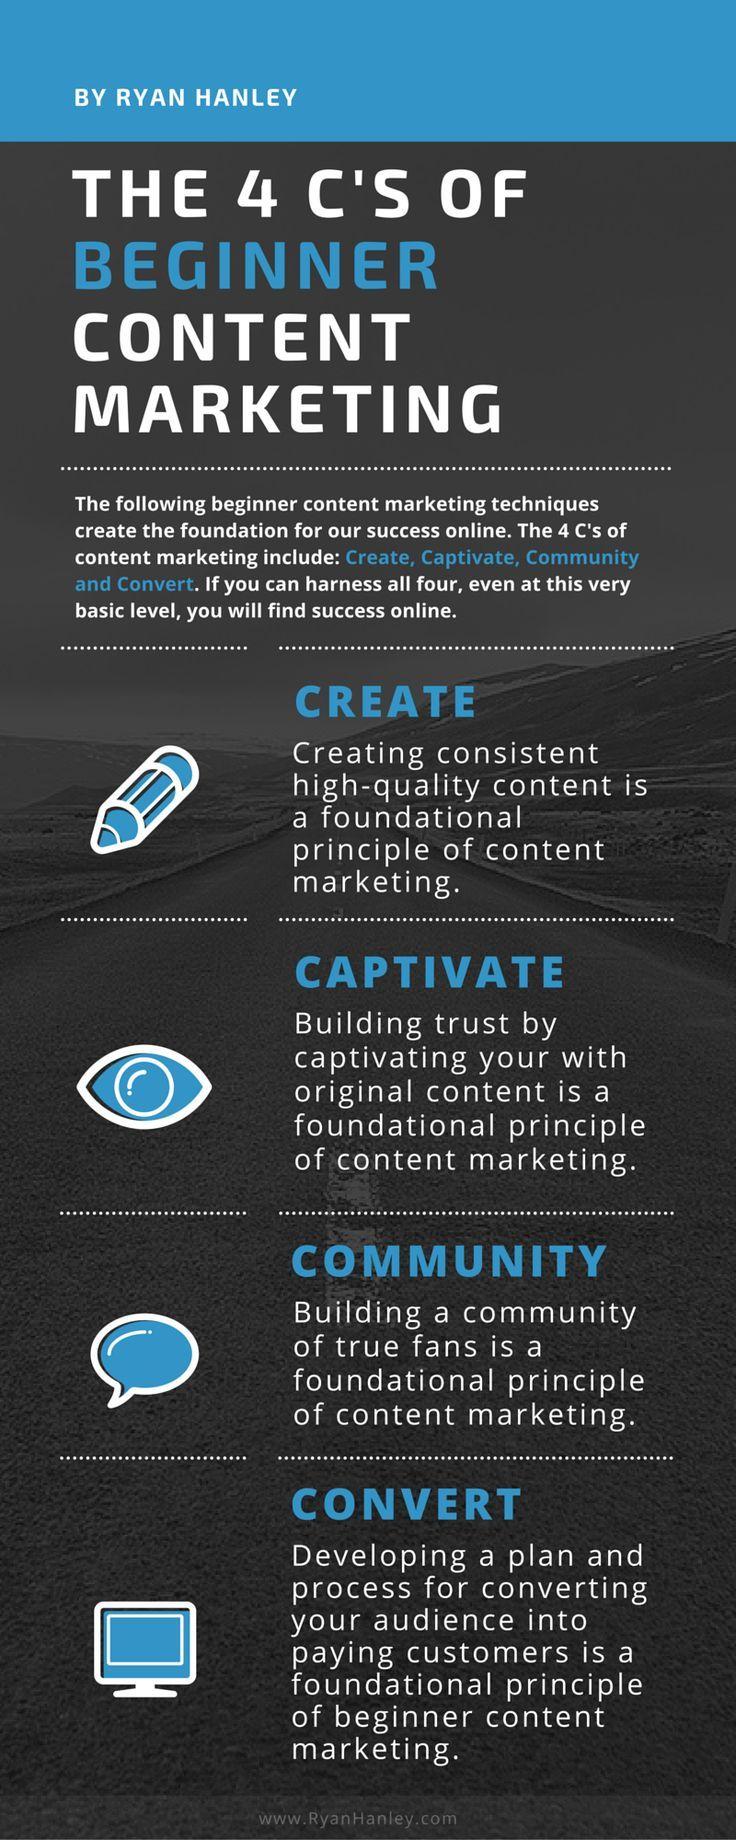 https://social-media-strategy-template.blogspot.com/ Beginner content marketing infographic- The 4 Cs: Create, Captivate, Community and Convert.